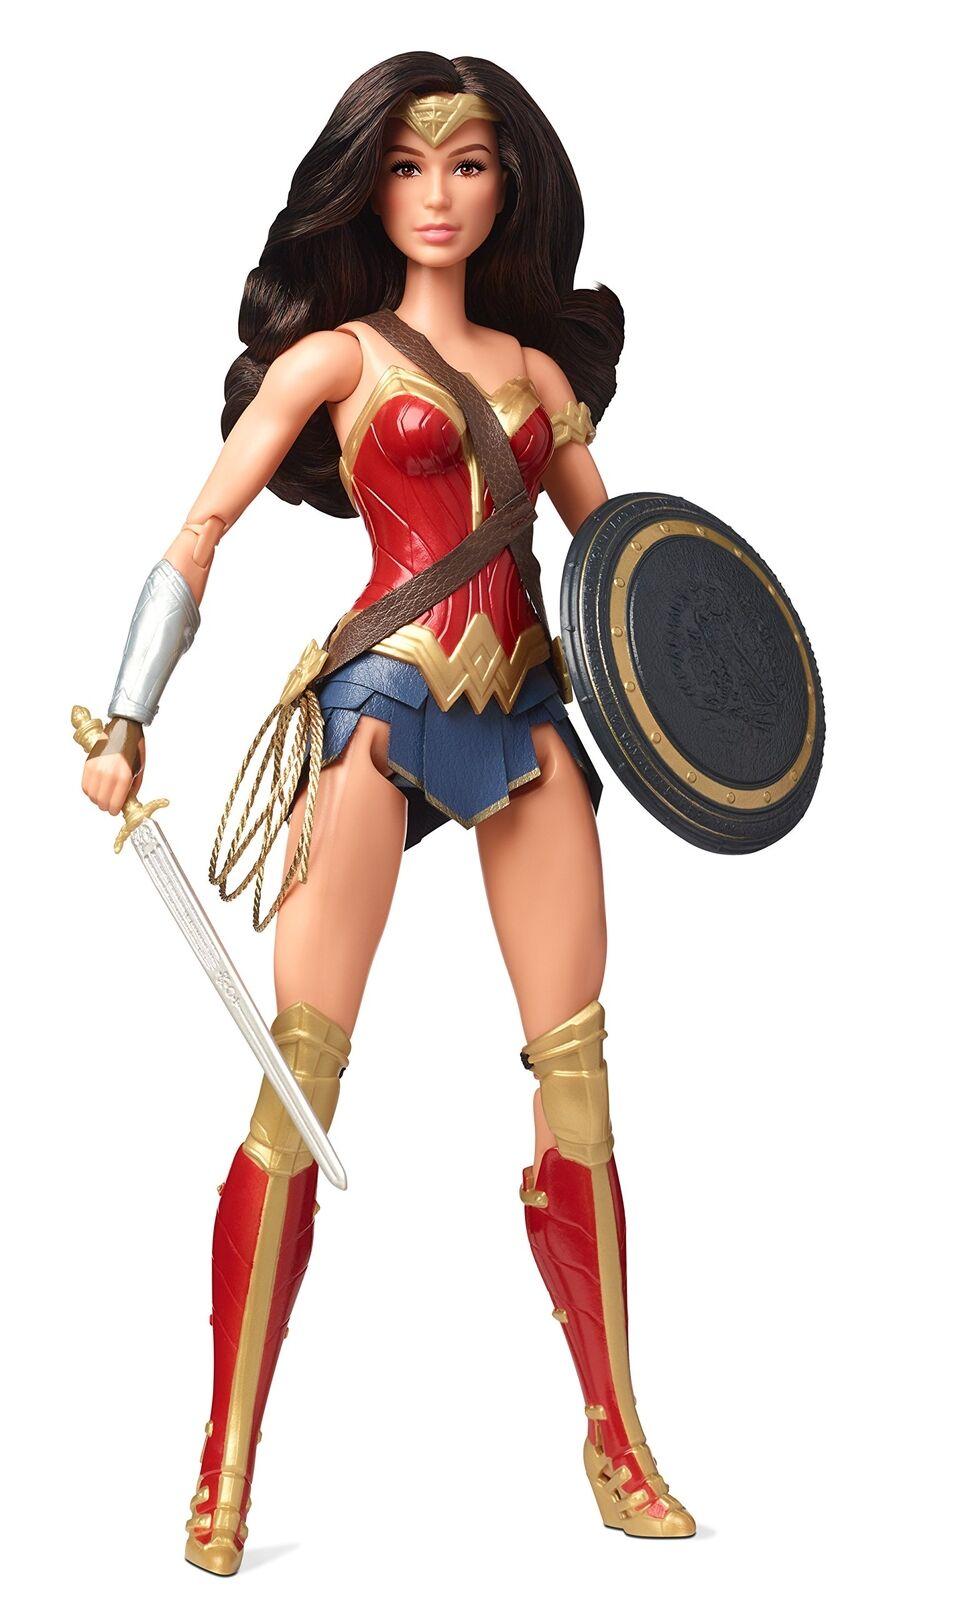 Barbie Justice League Wonder Woman Figure New Movie Xmas Girls Gift